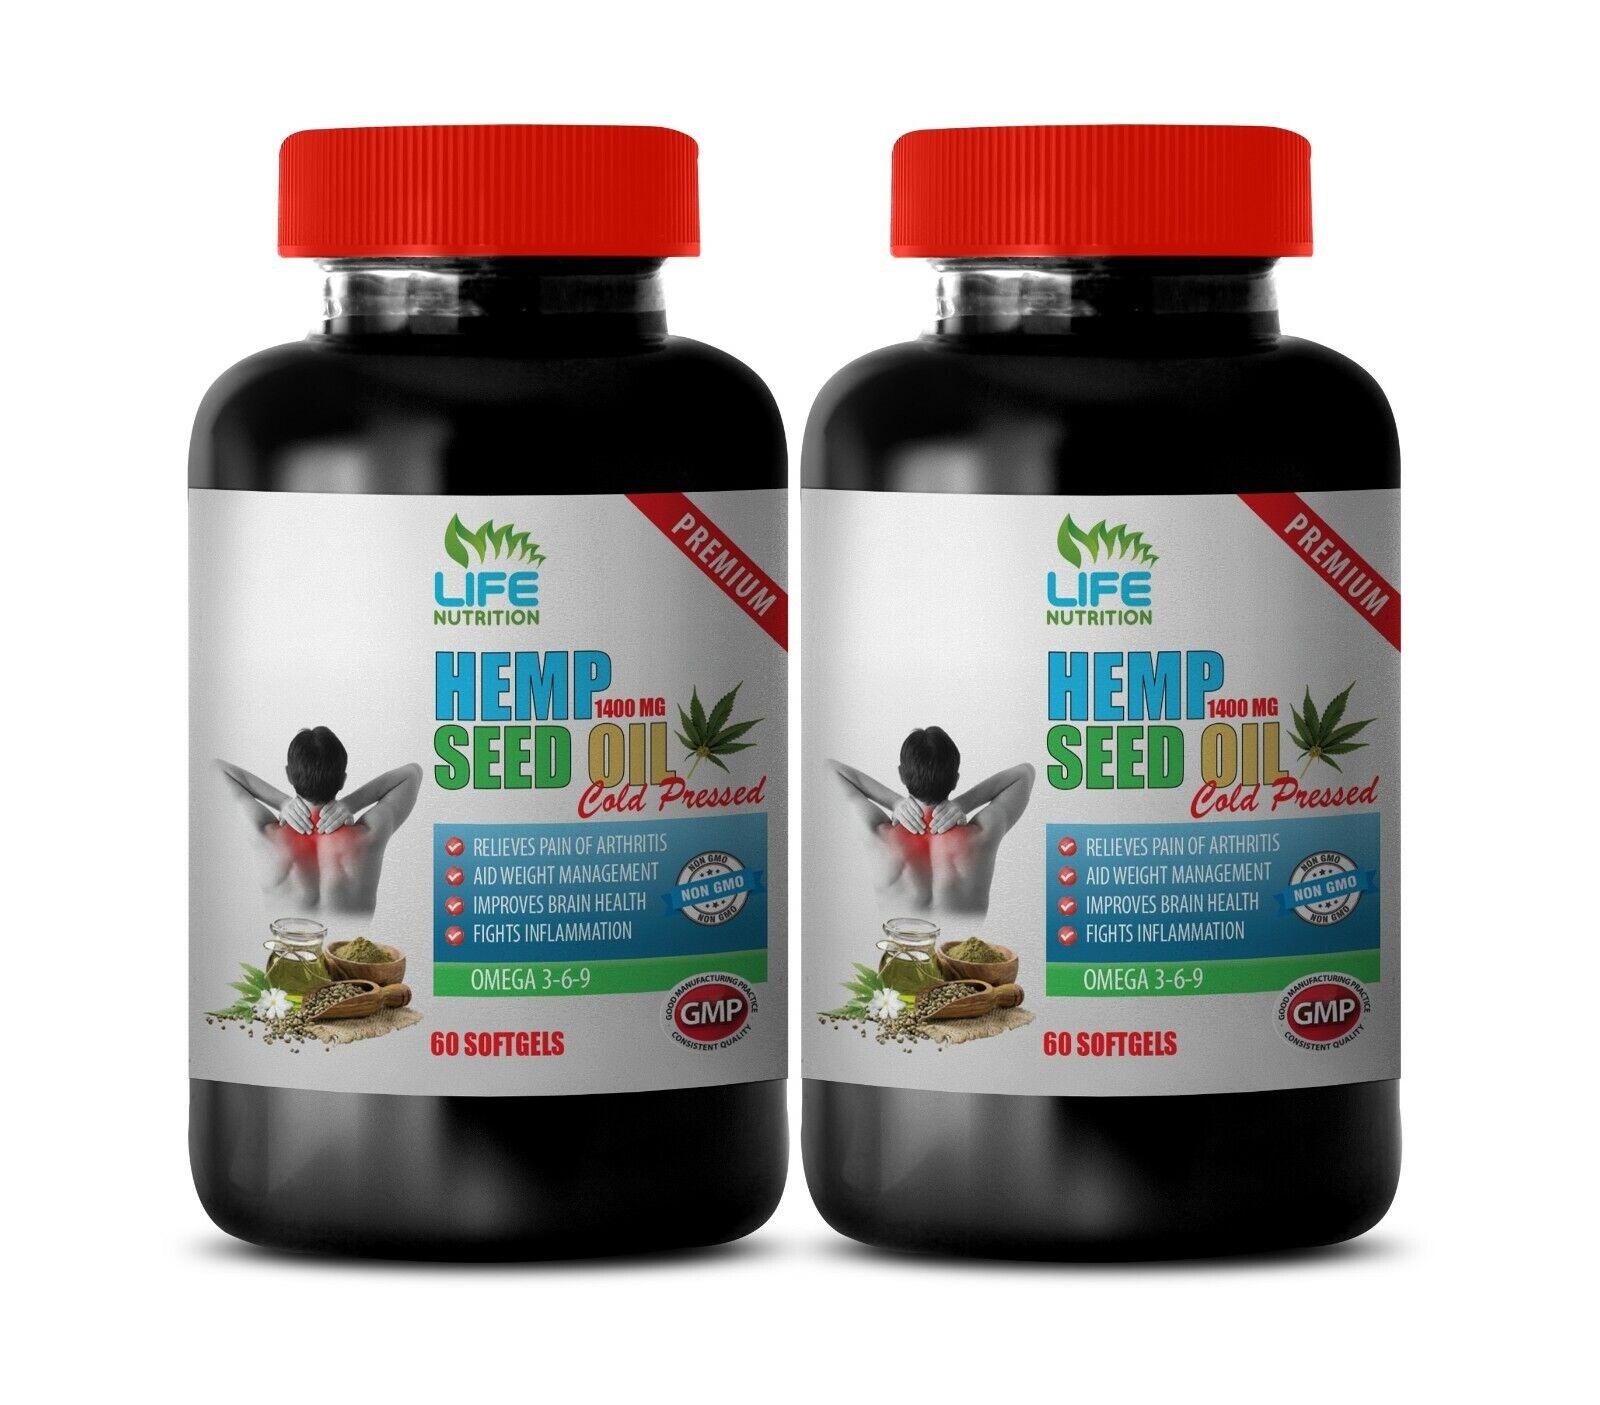 omega fatty acids, ORGANIC HEMP SEED OIL 1400mg, joint pain relief 2B